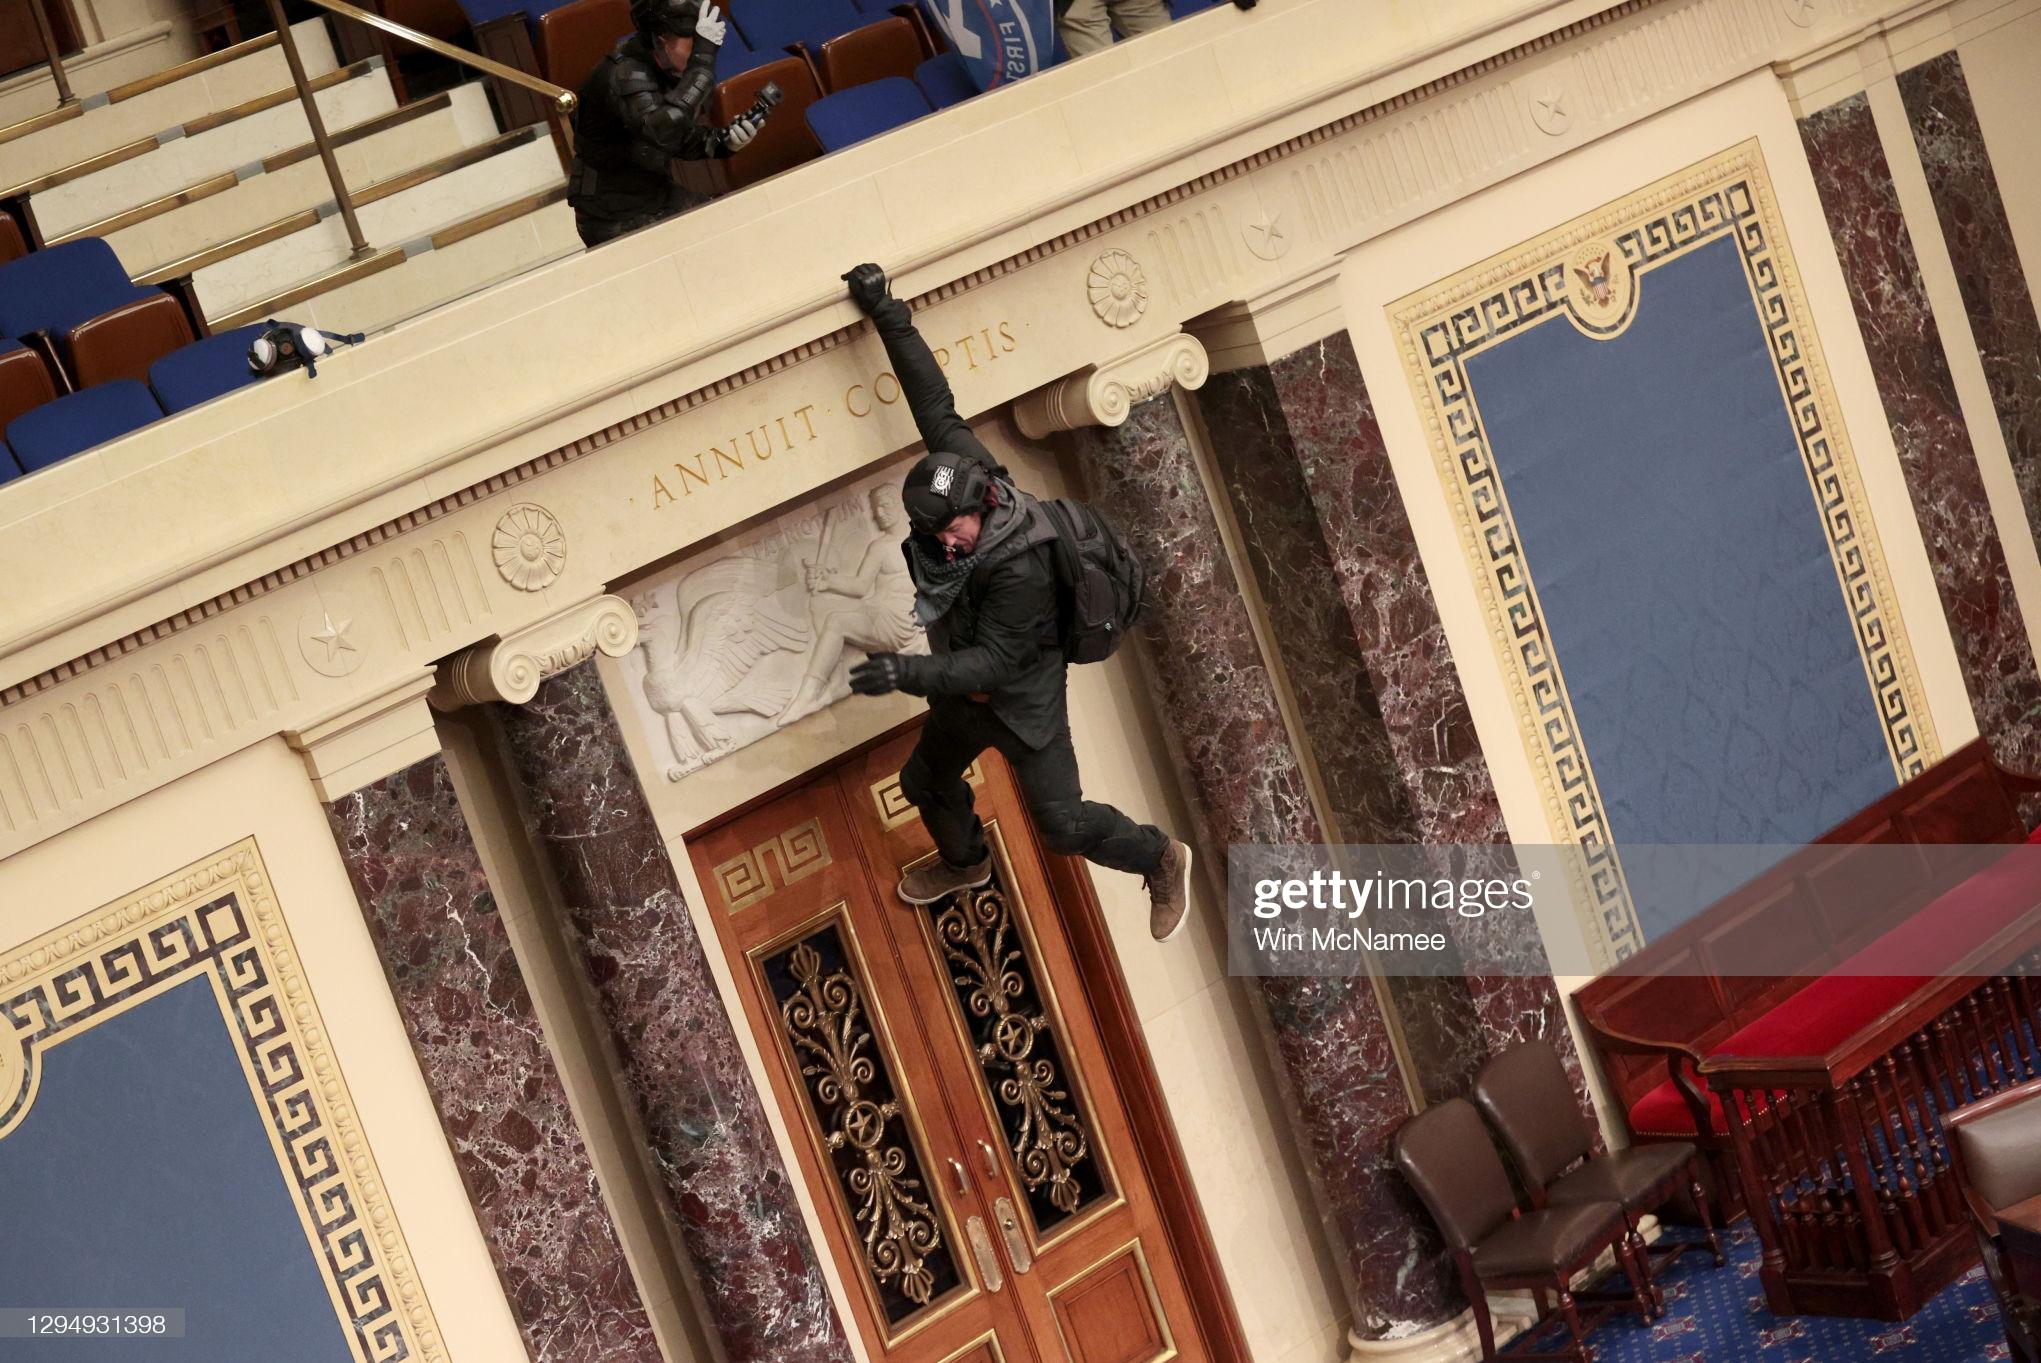 13991018000121 Test NewPhotoFree - بحران آمریکا| برقراری حکومت نظامی در واشنگتن؛ 4 نفر کشته شدند